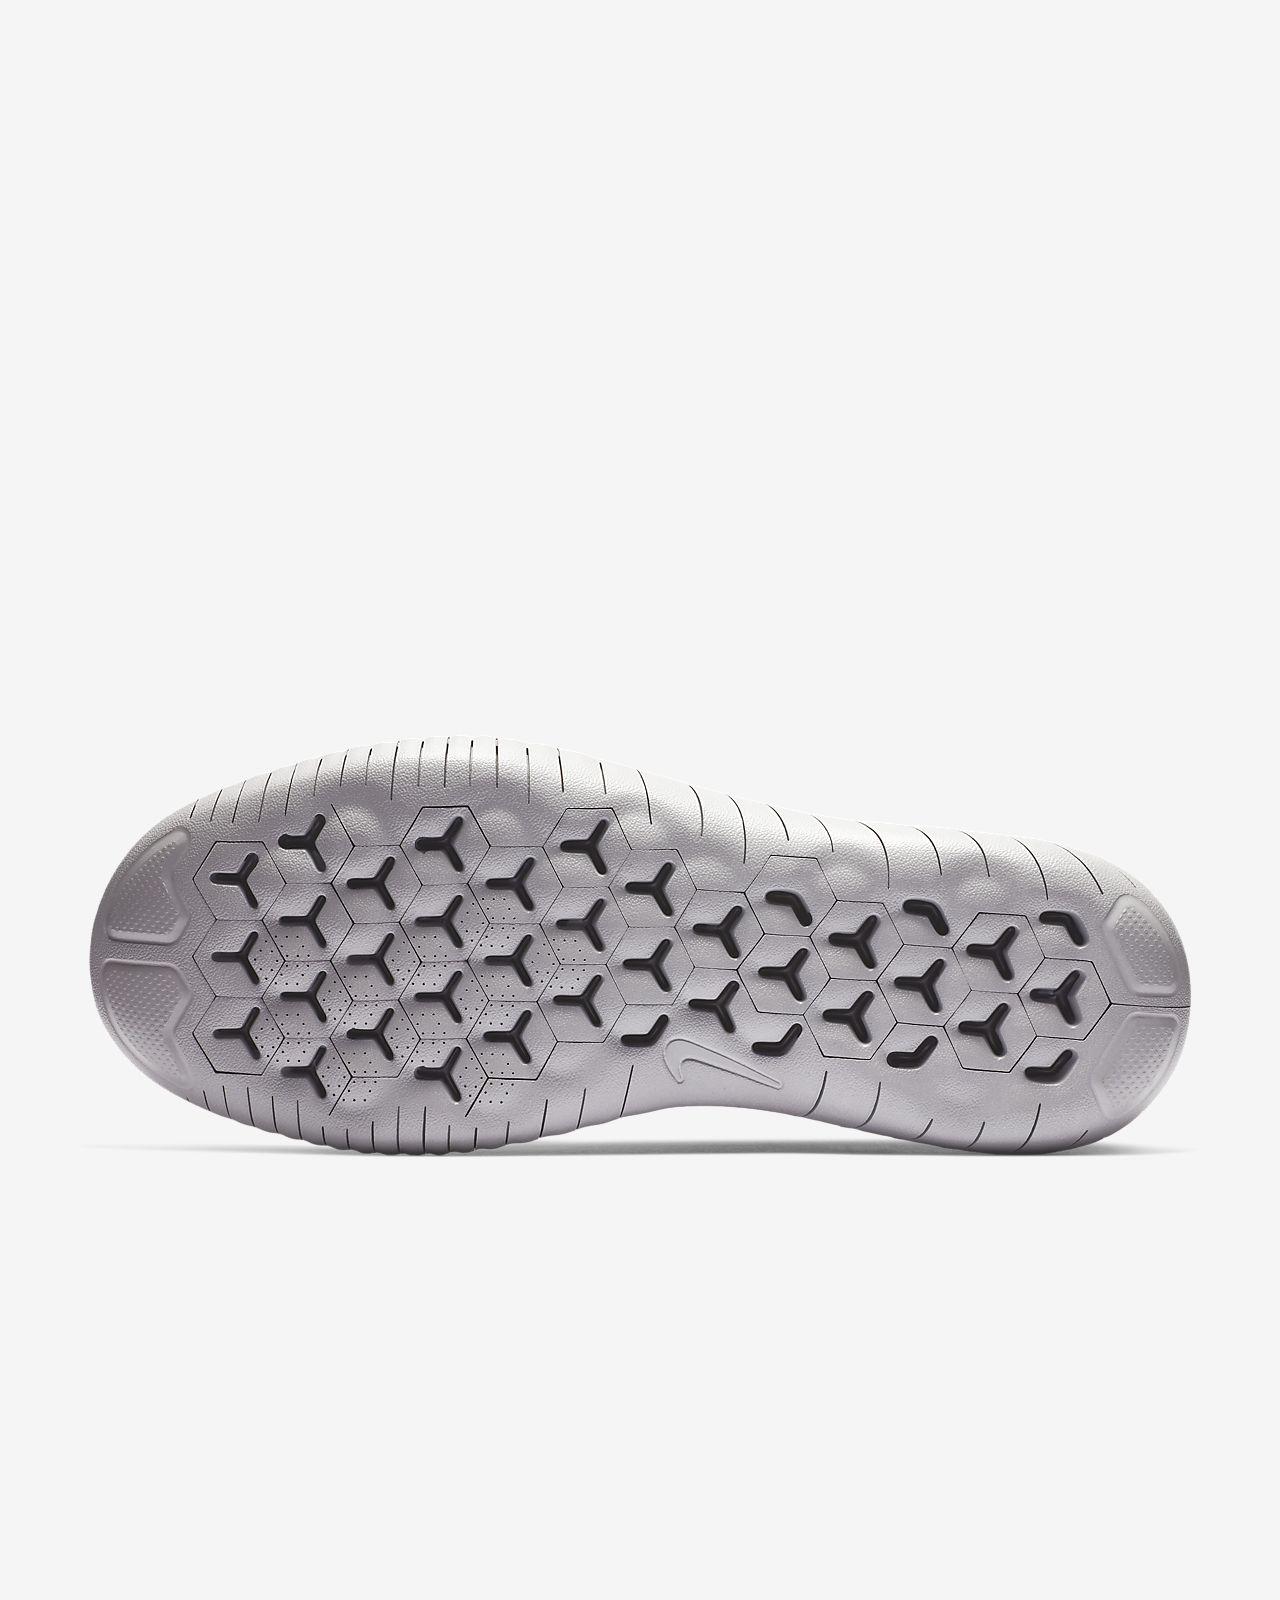 Adidas fit foam flip flops, the comfiest flip flops I've